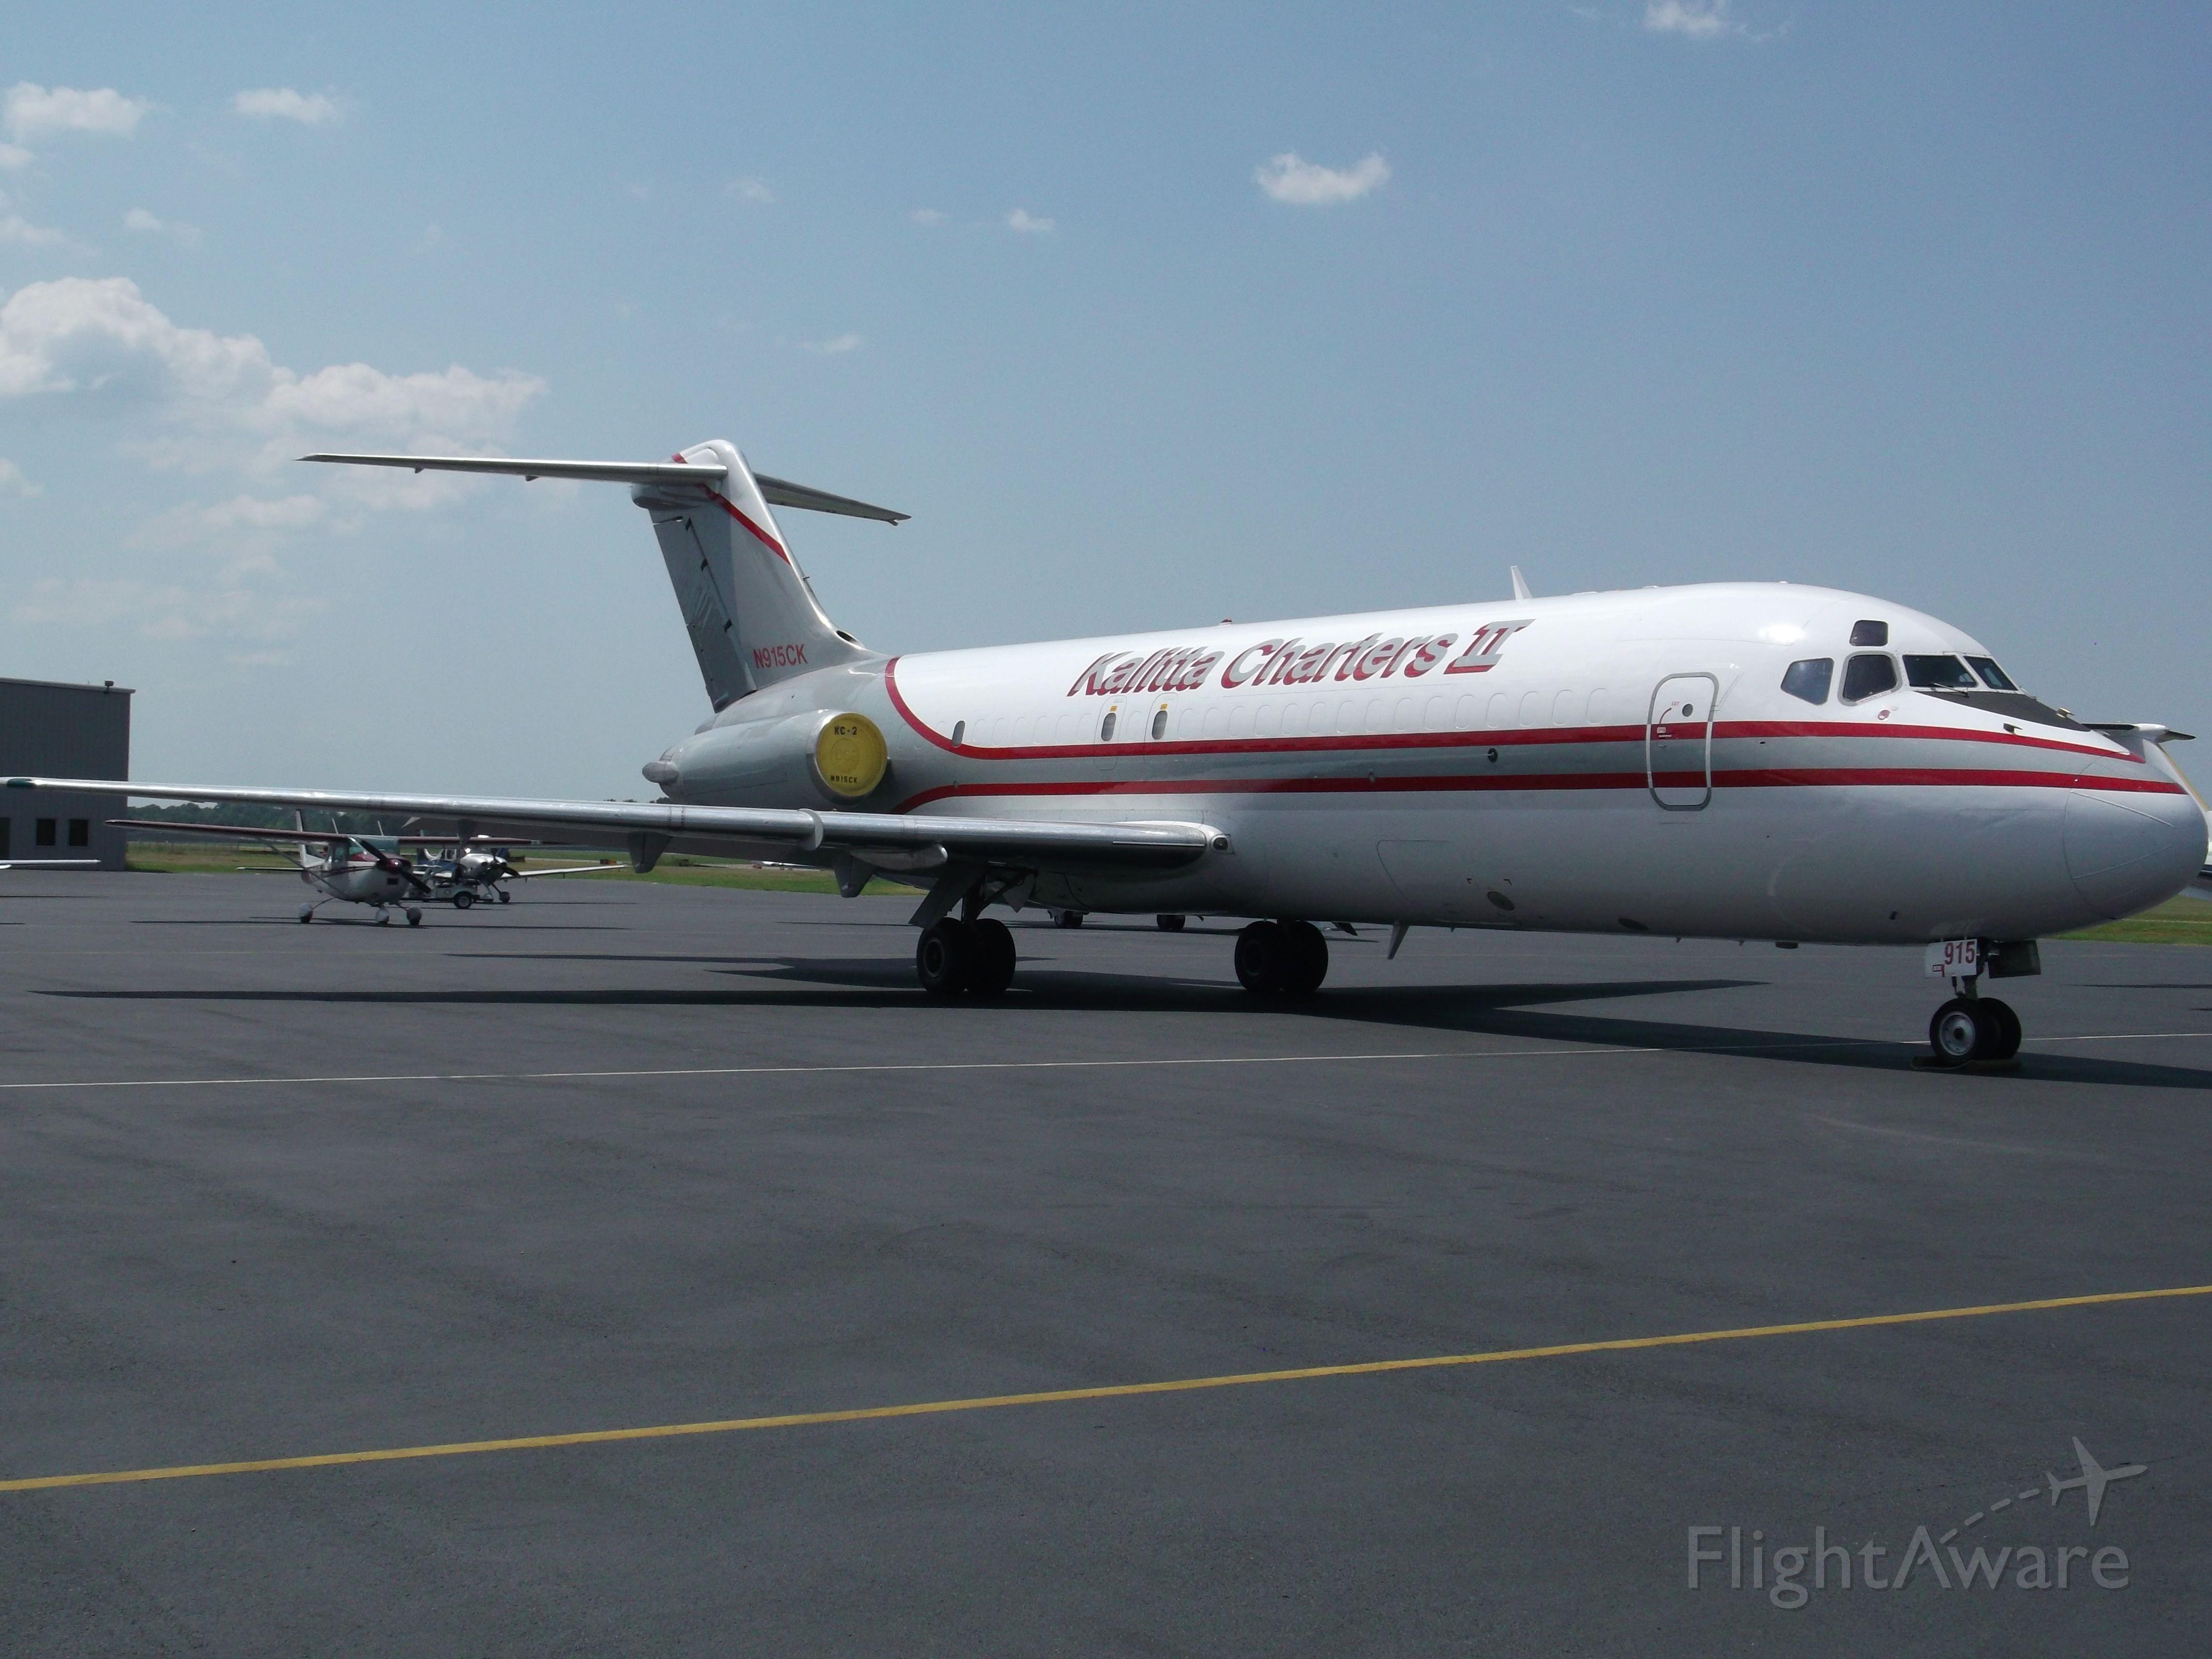 Douglas DC-9-10 (N915CK) - Kalitta Charters II Frieghter